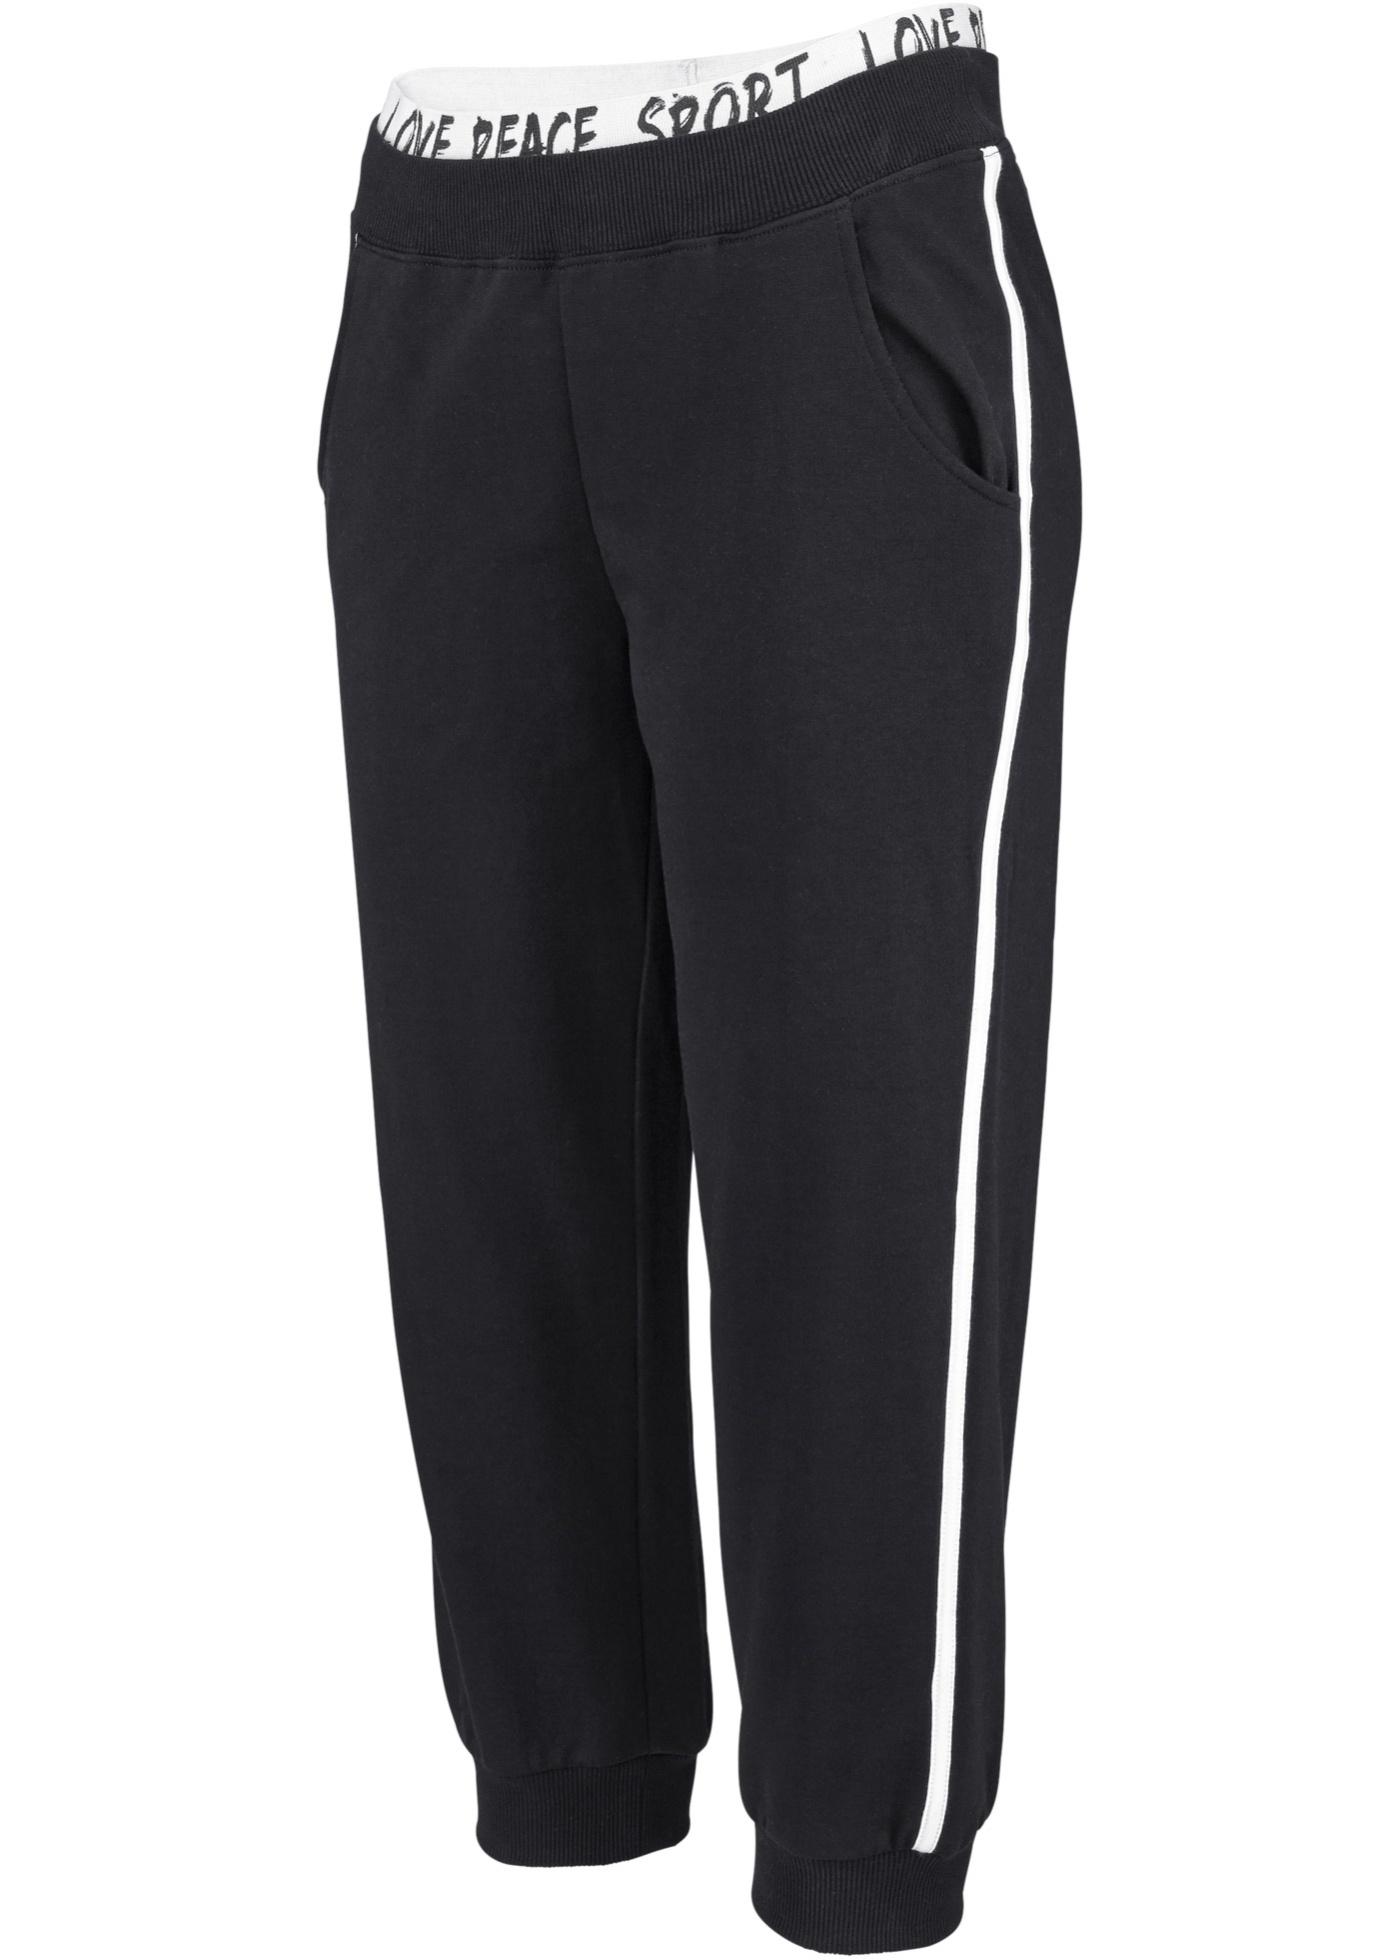 Pantalon jogging longueur 3/4